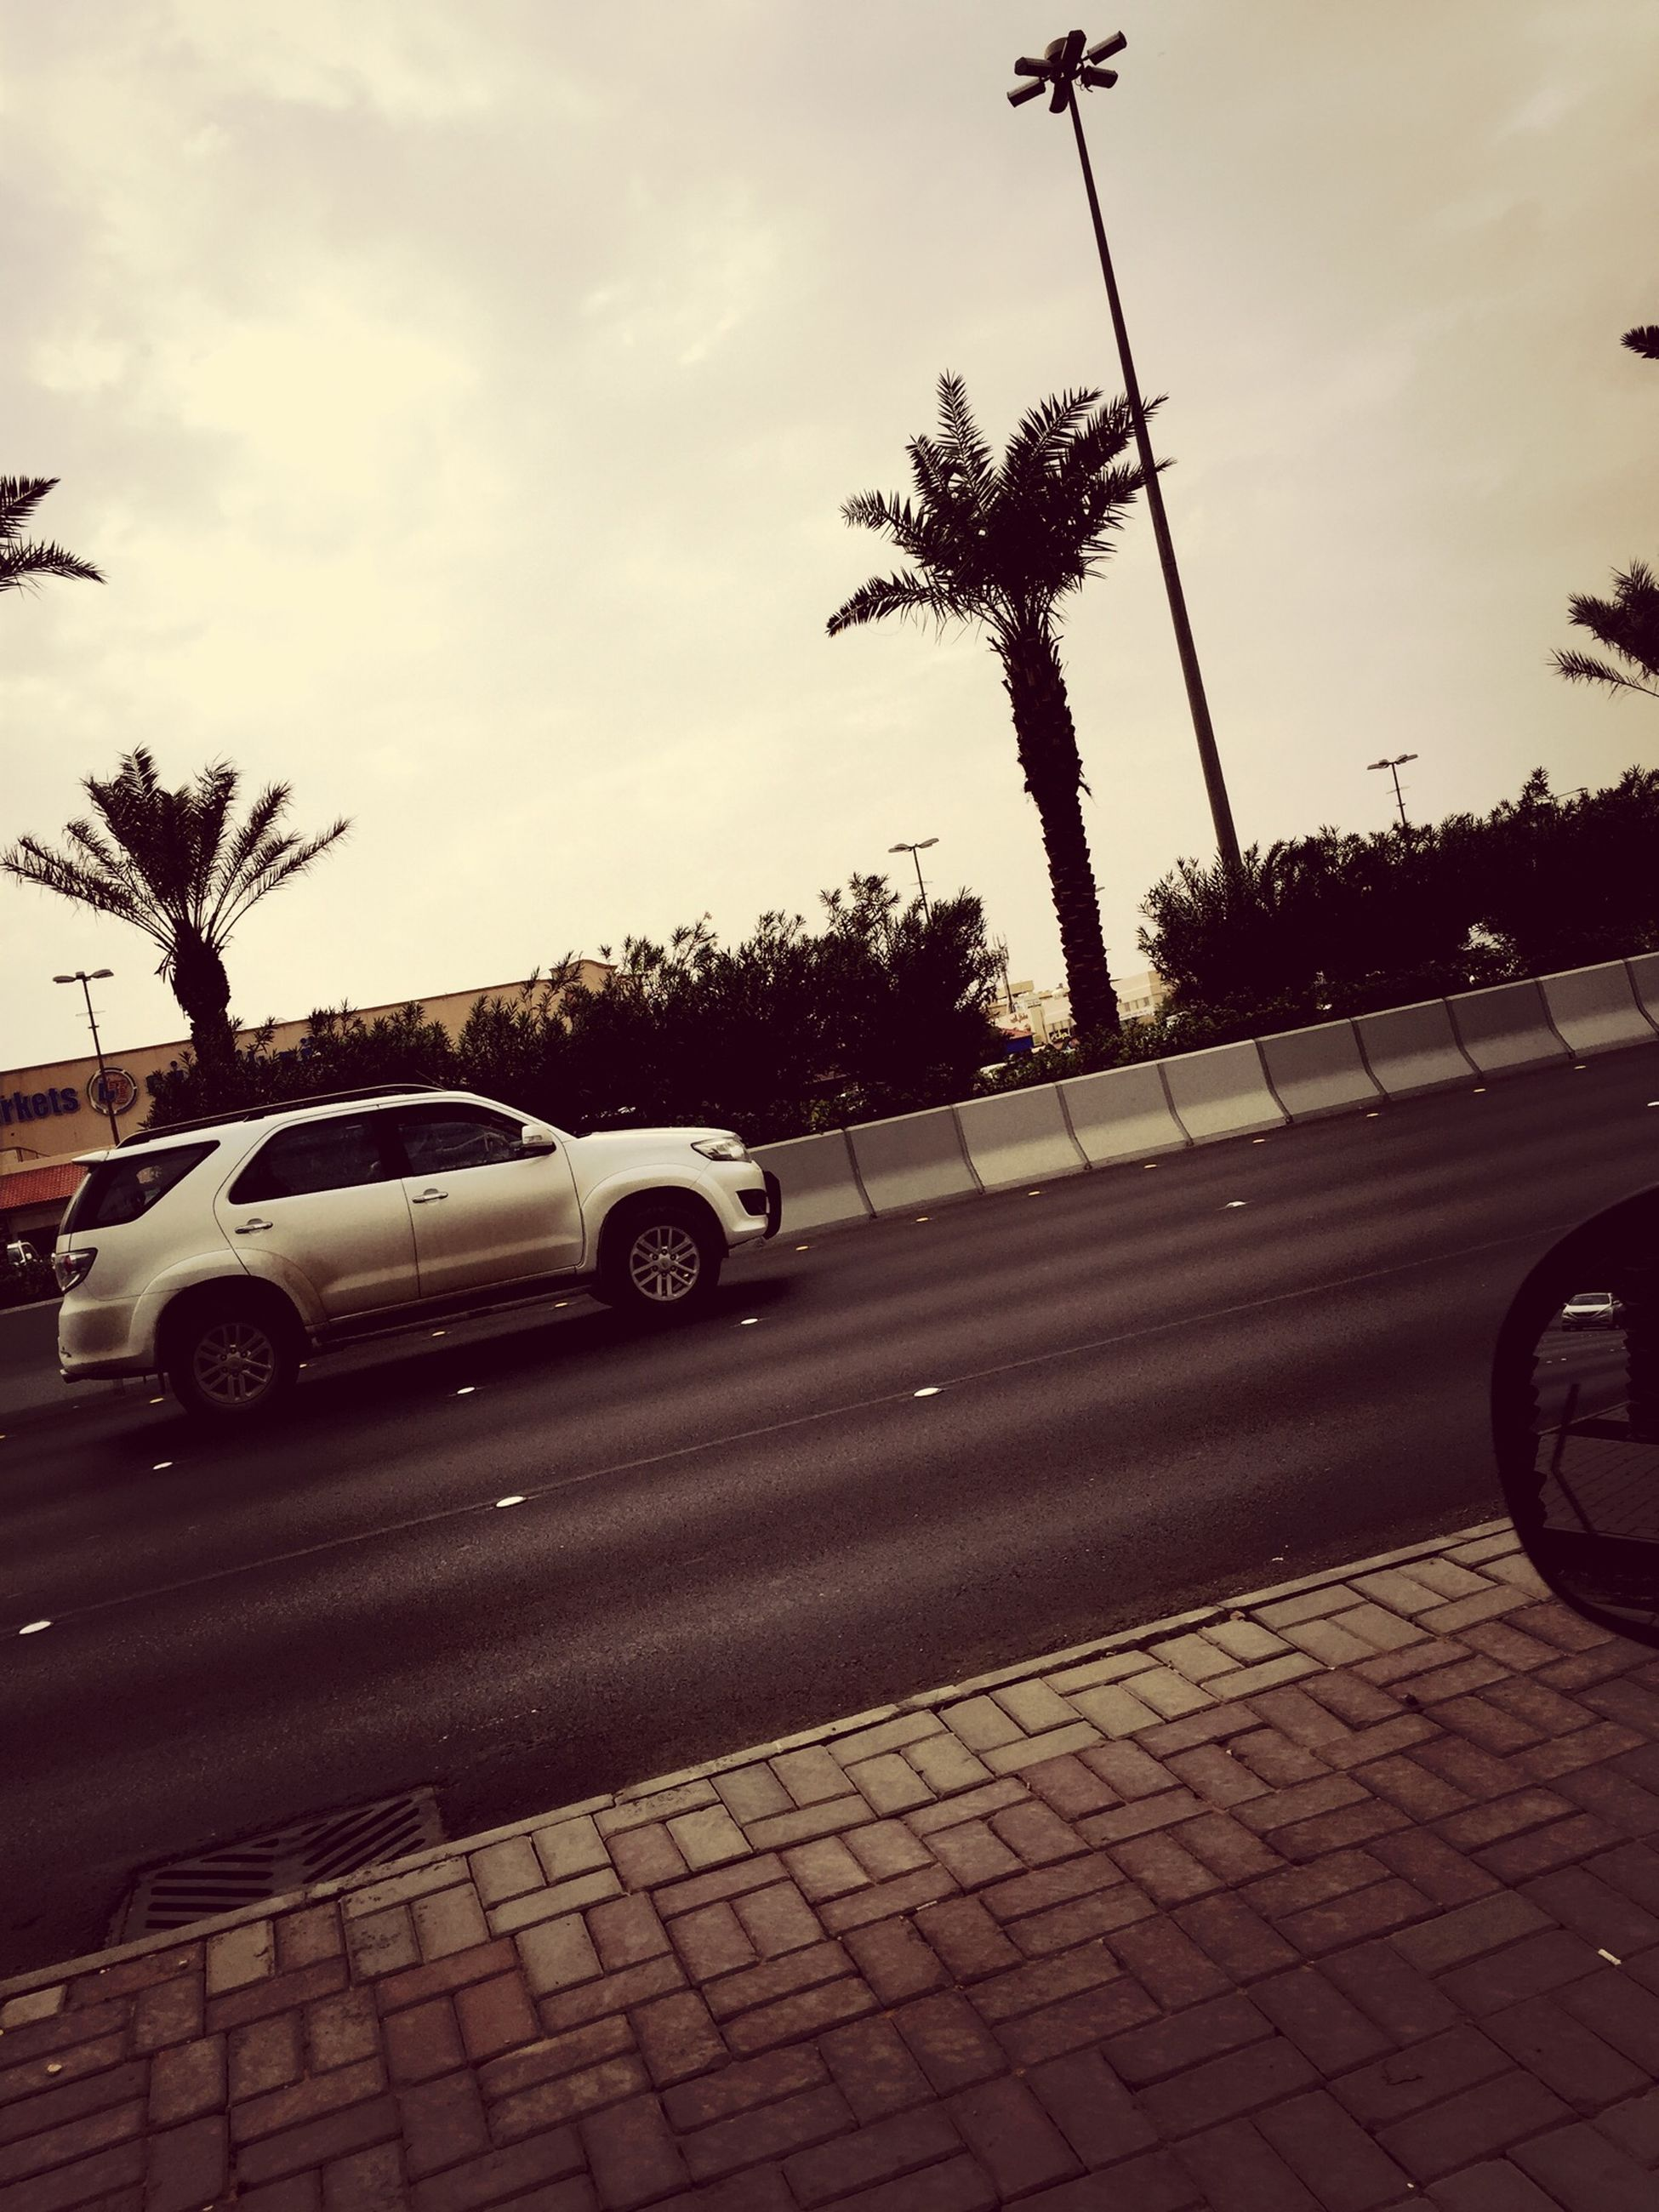 transportation, land vehicle, car, mode of transport, road, street, sky, tree, road marking, cloud - sky, palm tree, on the move, street light, traffic, cloud, travel, city street, city, outdoors, parking